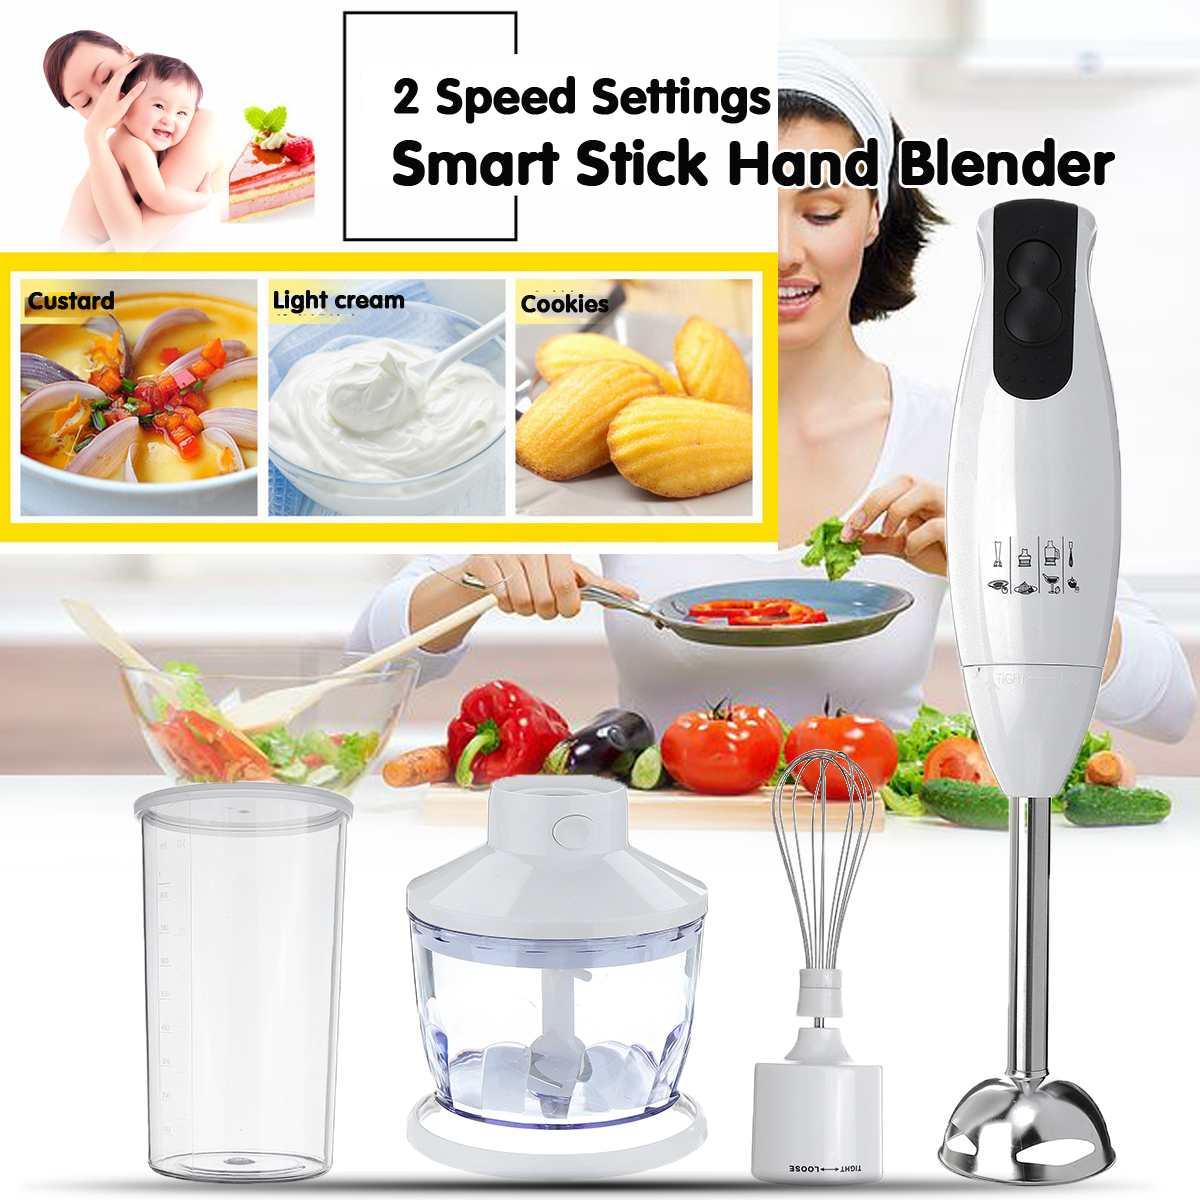 220V 450W Hand Blenders Portable Electric Stick Mixer Smart Speed Food Processor Set Handheld Stick Blenders EU Plug